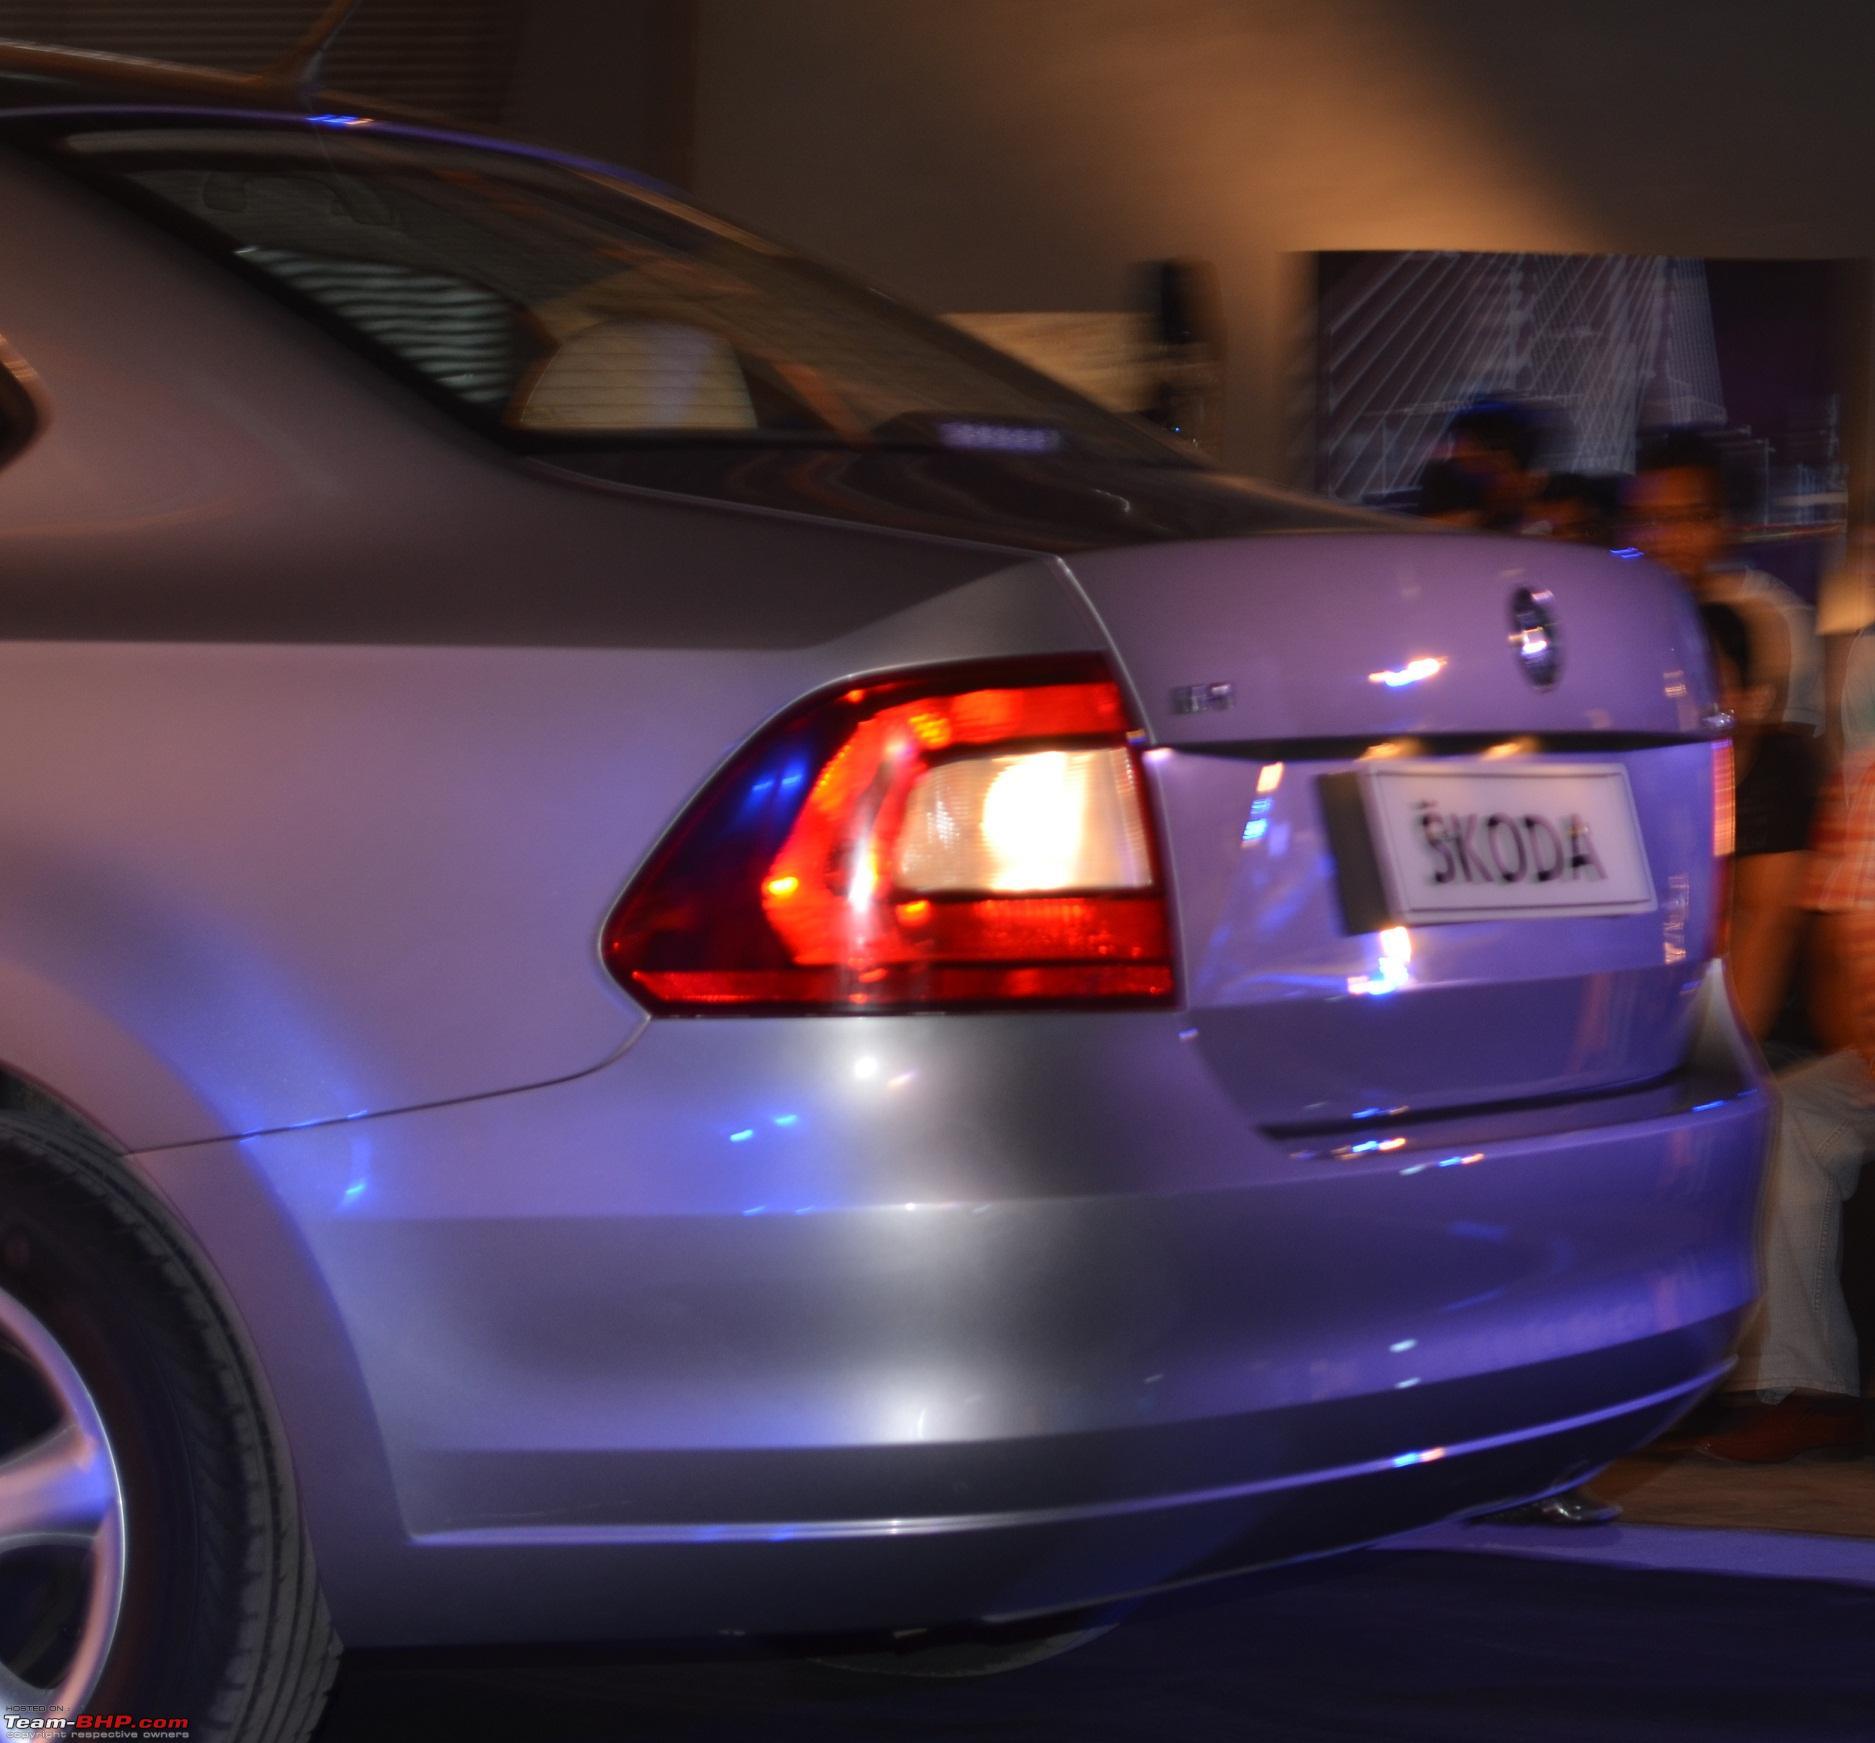 Skoda Rapid rear